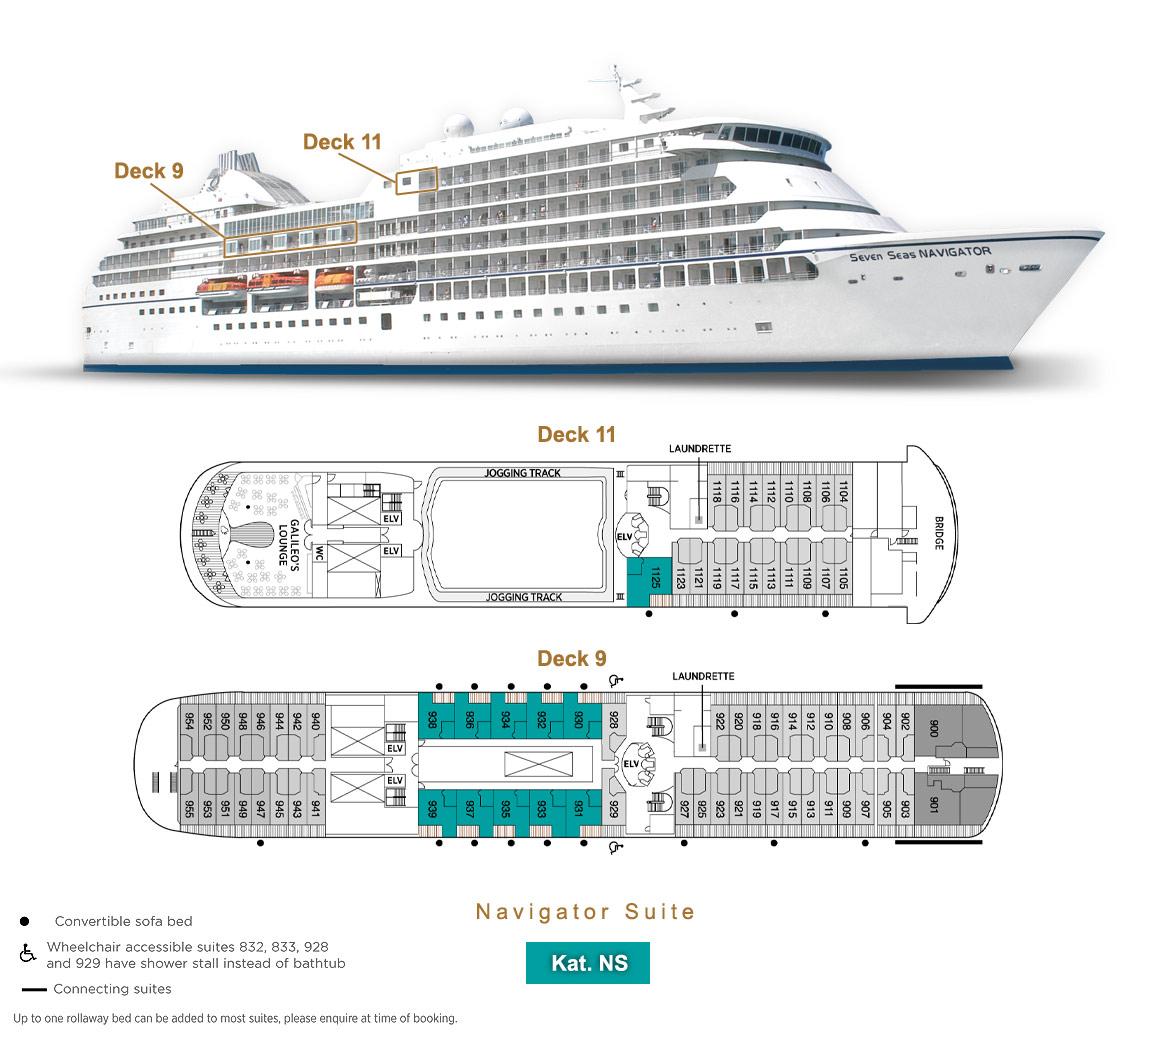 Navigator Suite NS - Seven Seas Navigator - Bild 3 - Lage Thumb